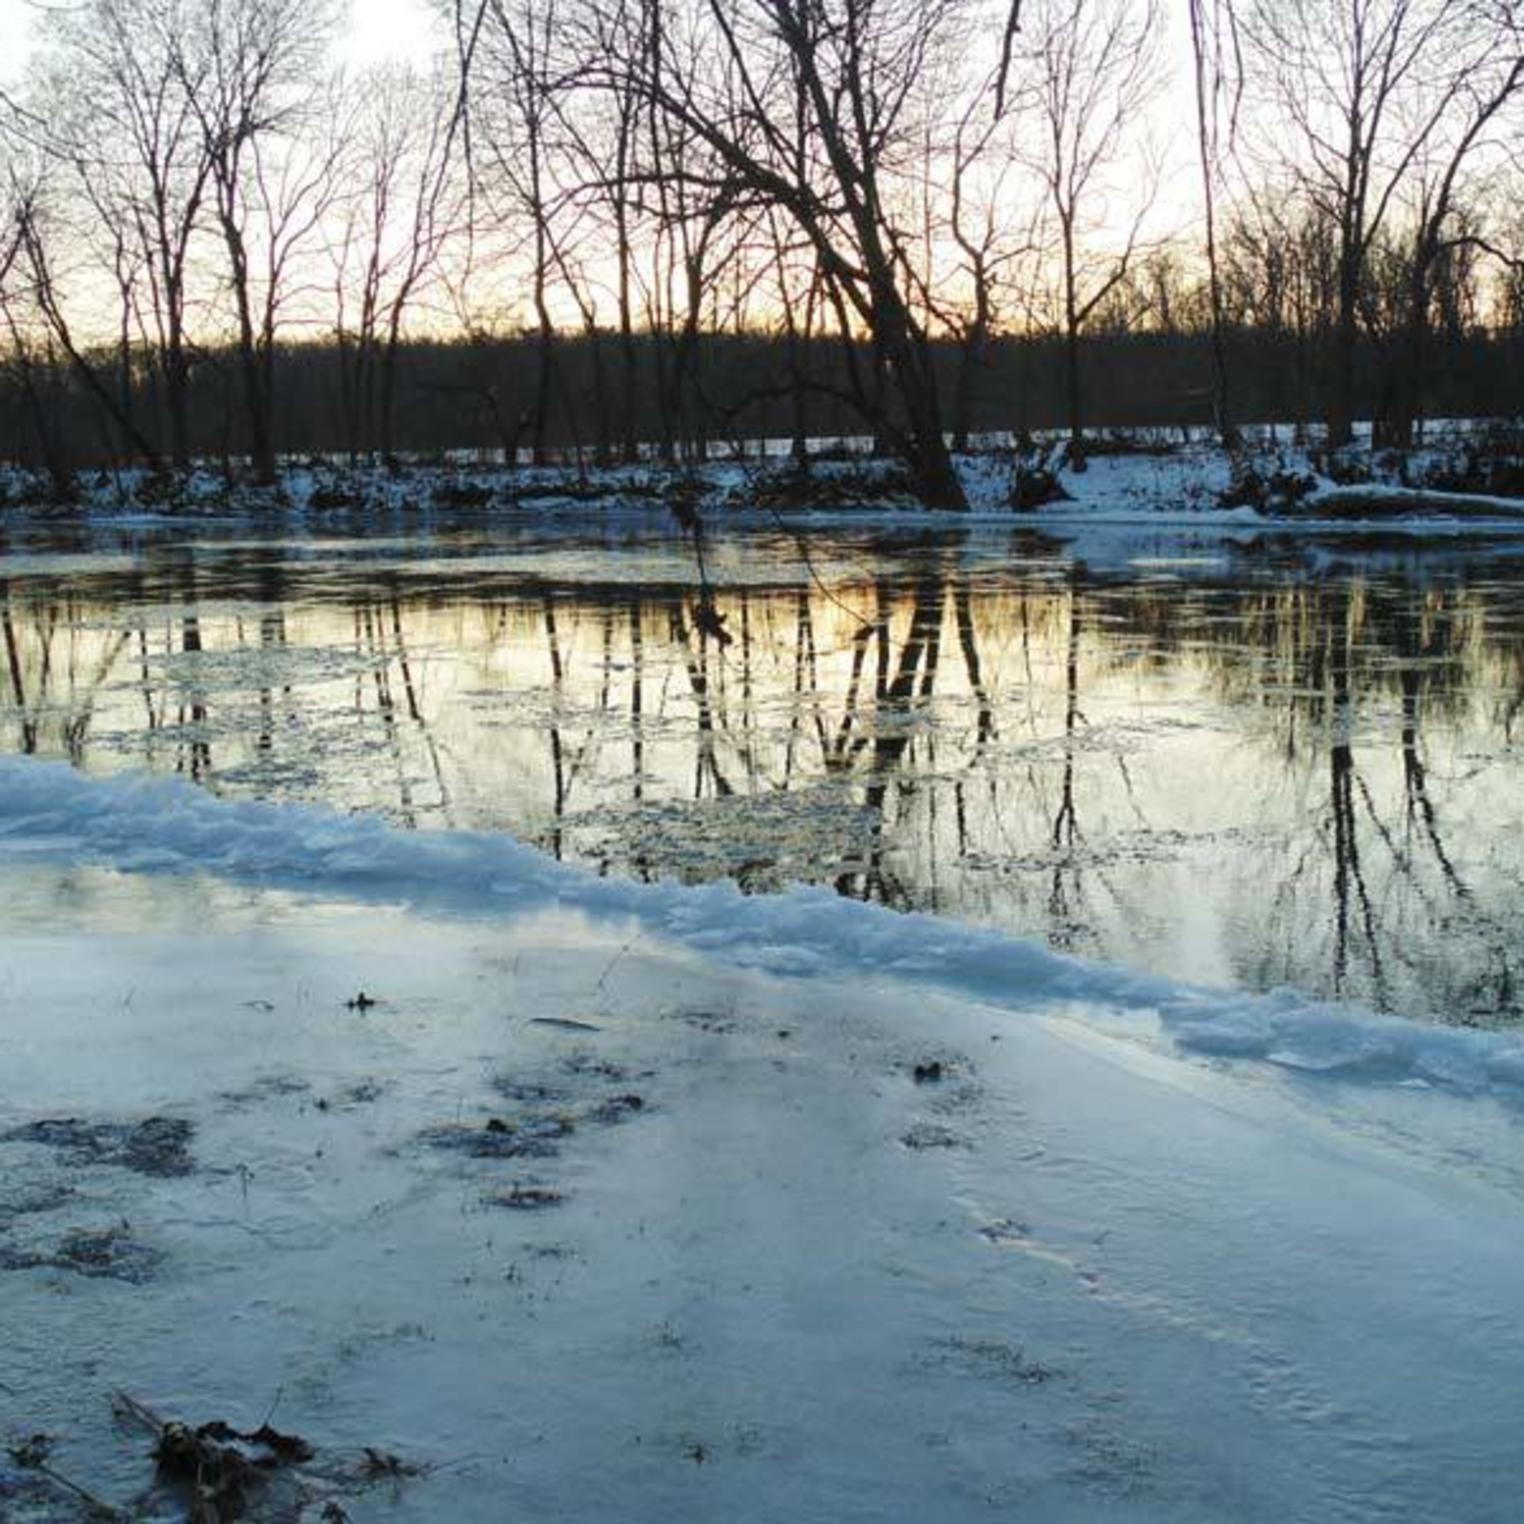 Conodoguinet Creek in Winter